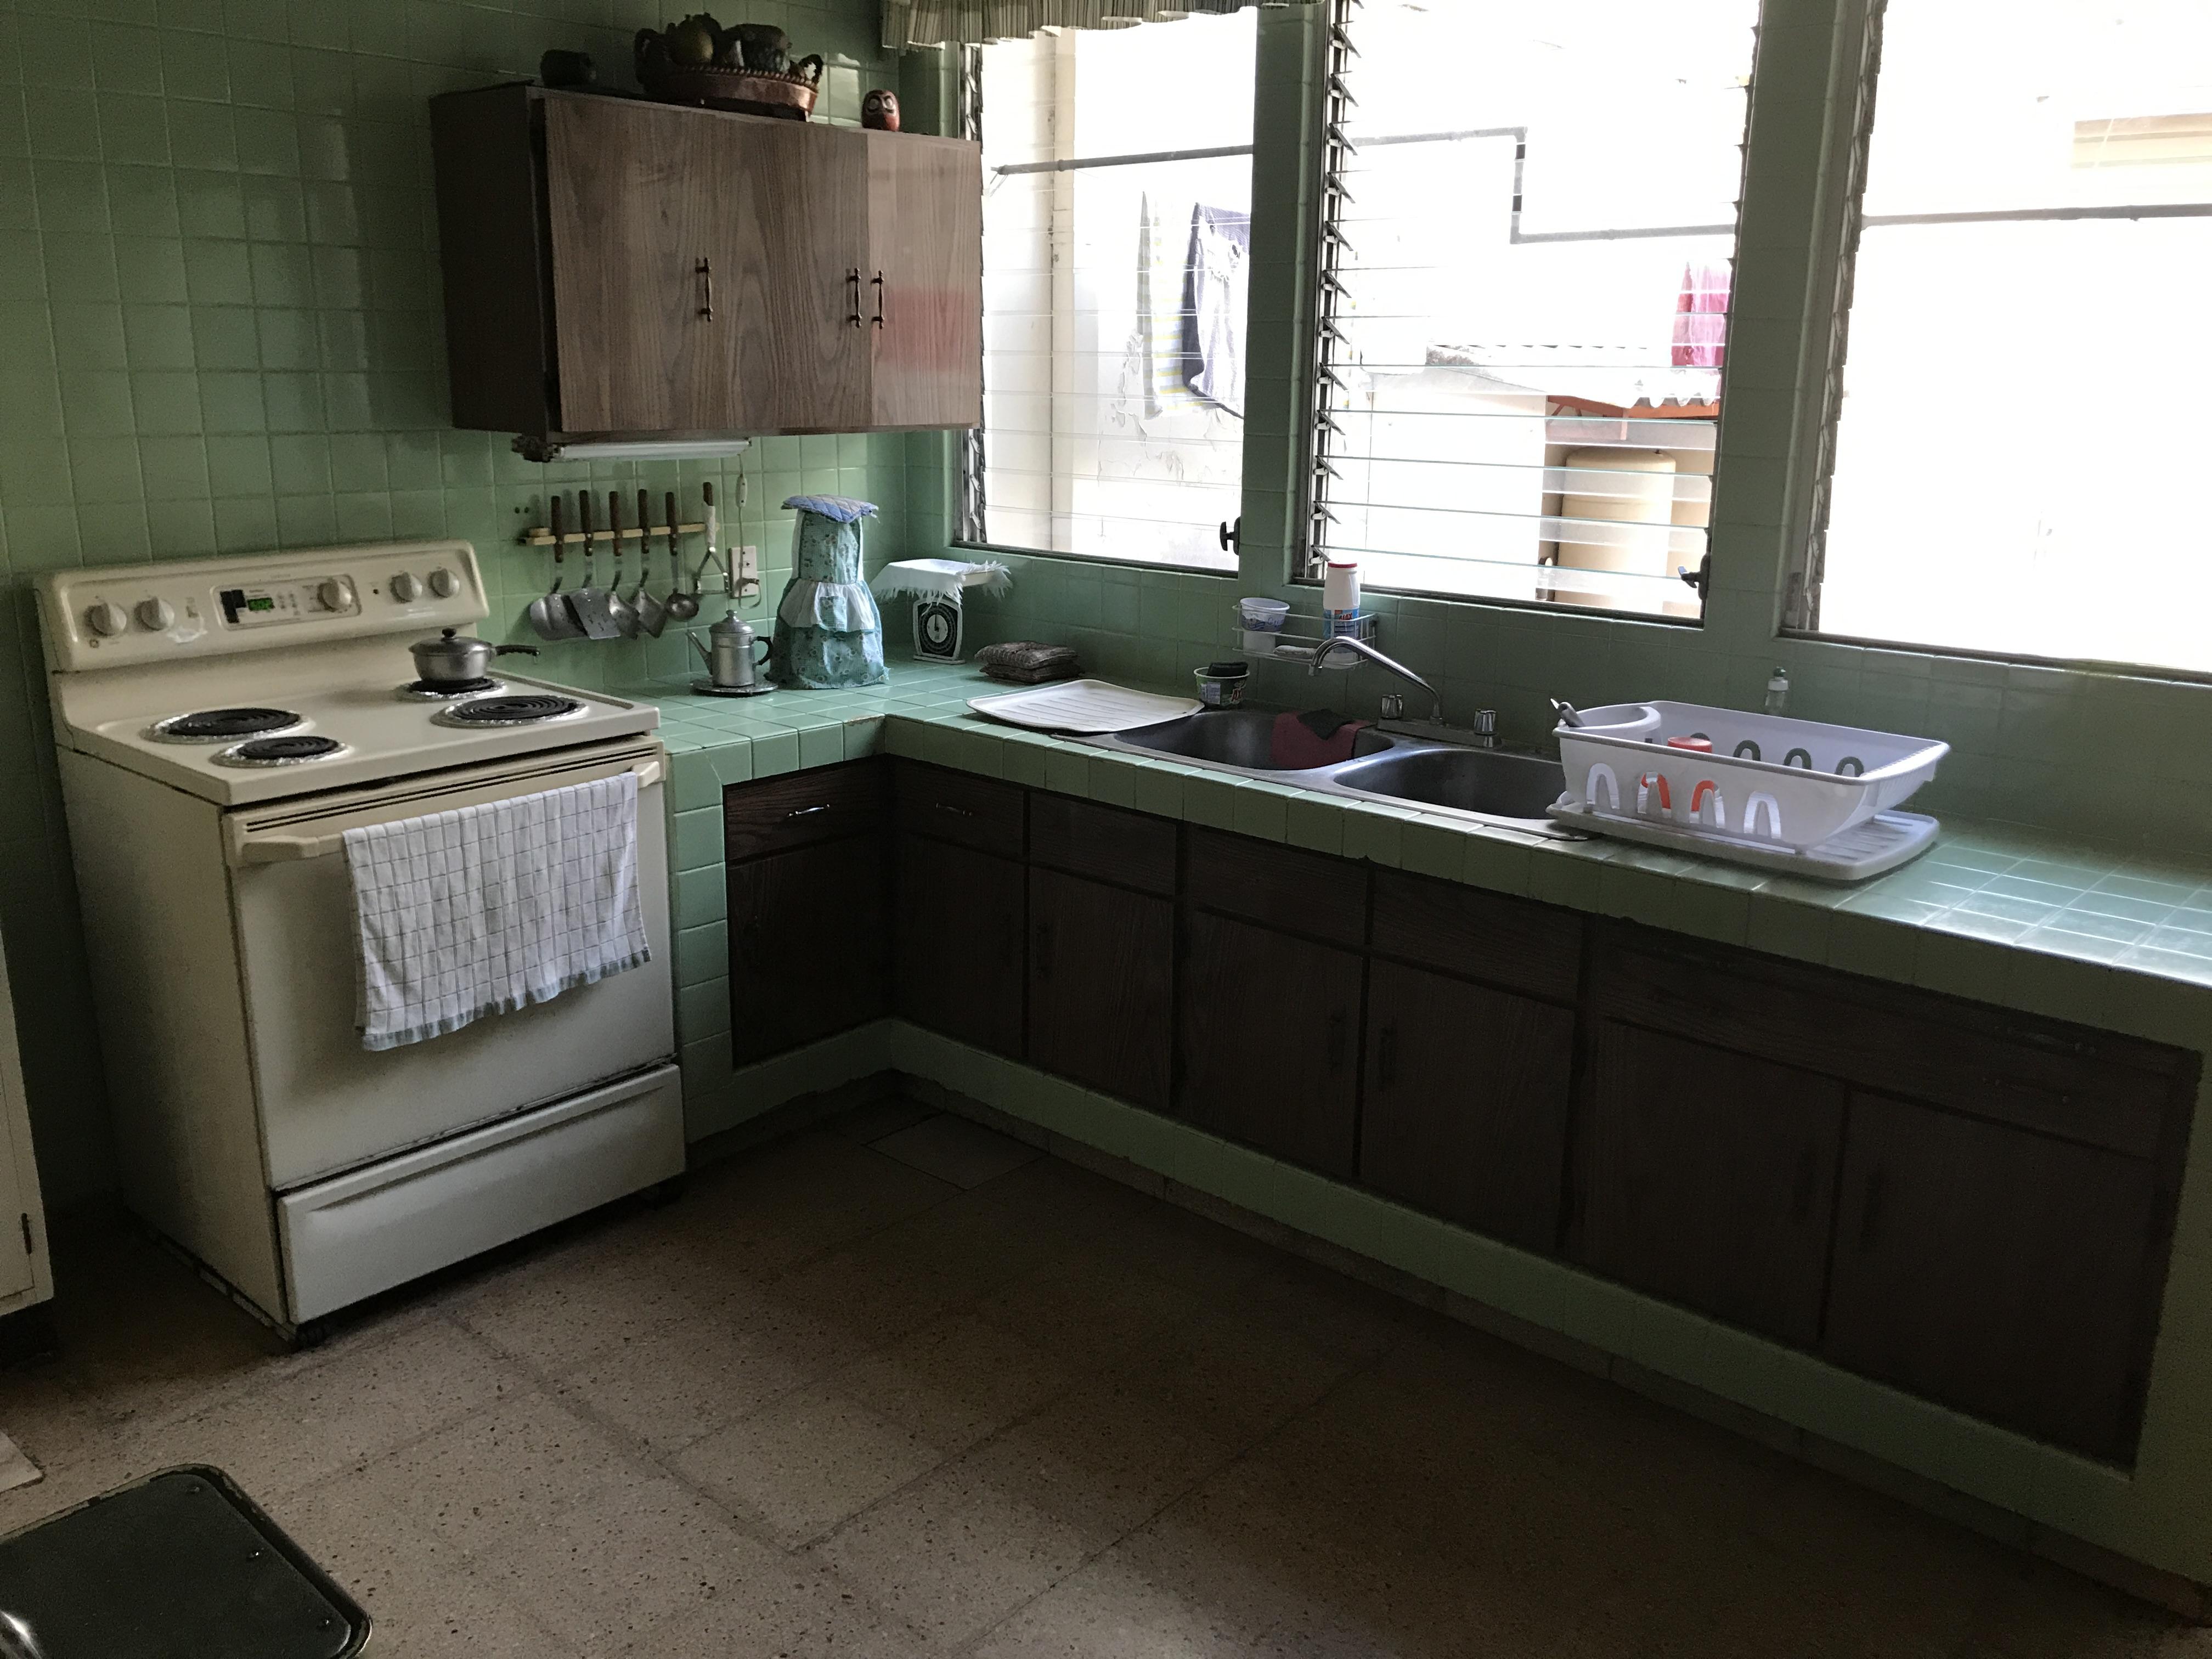 Casa de Venta Masferrer  cocina